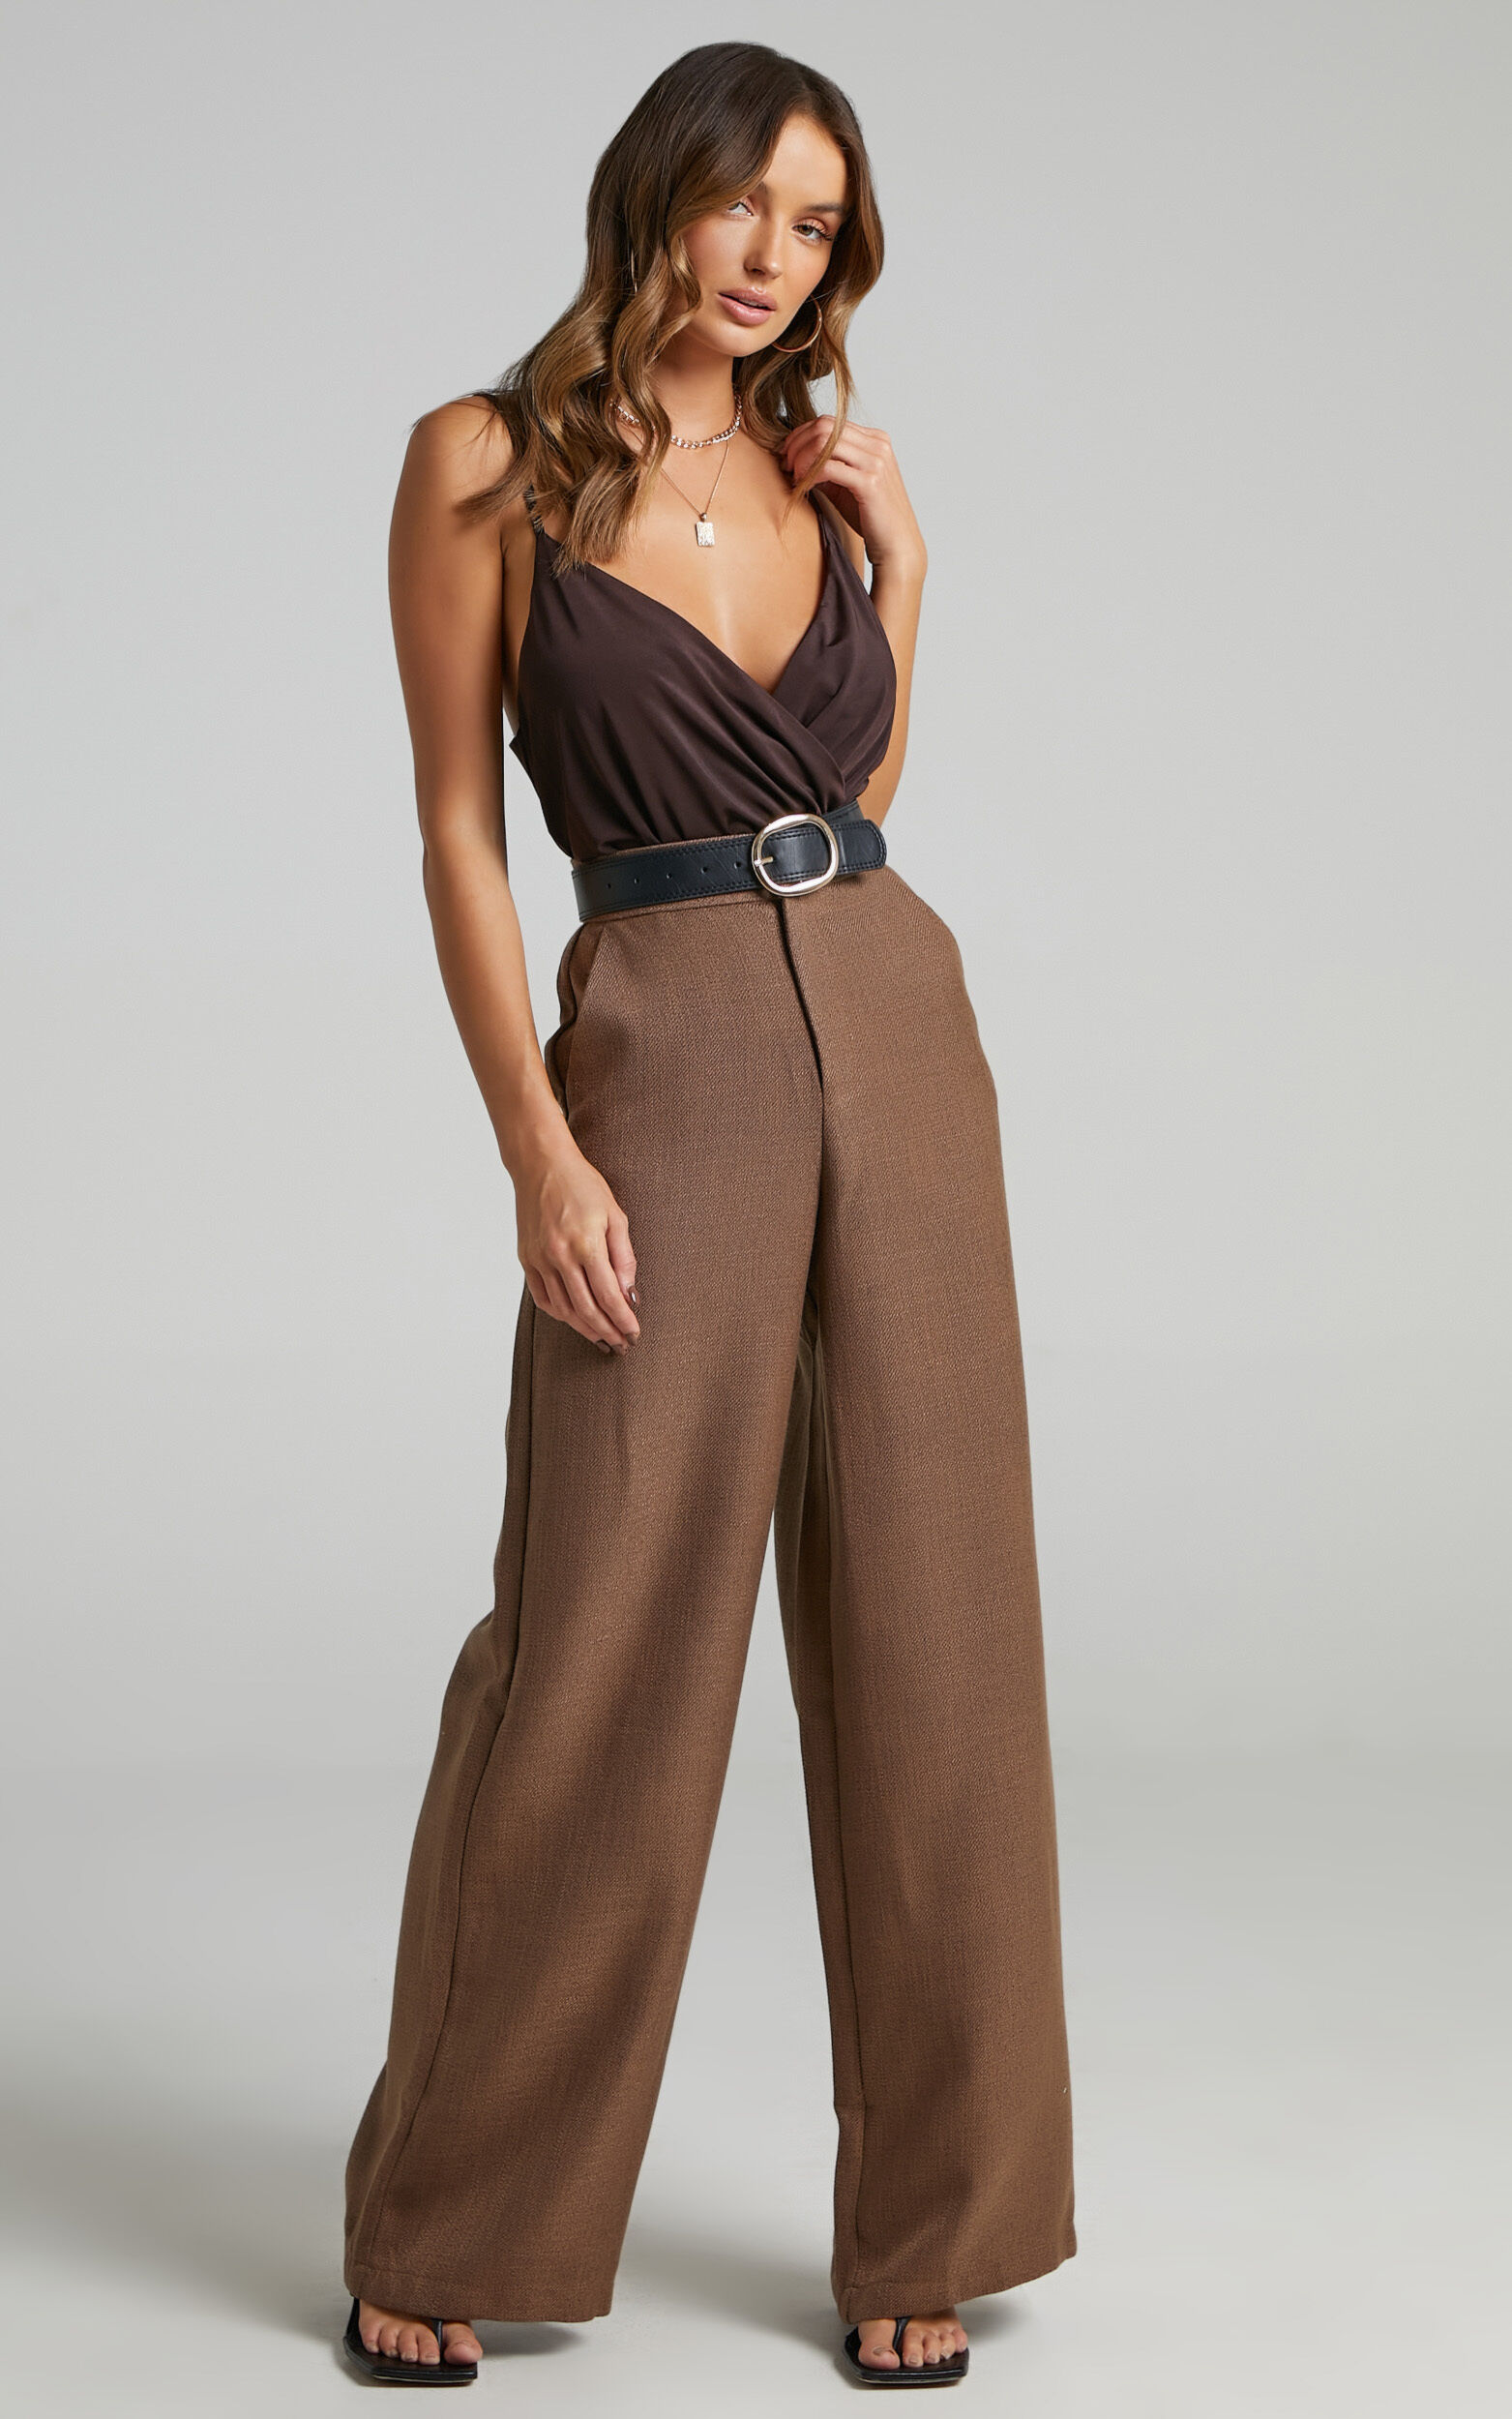 Kiros Wrap Bodysuit in Chocolate - 06, BRN3, super-hi-res image number null